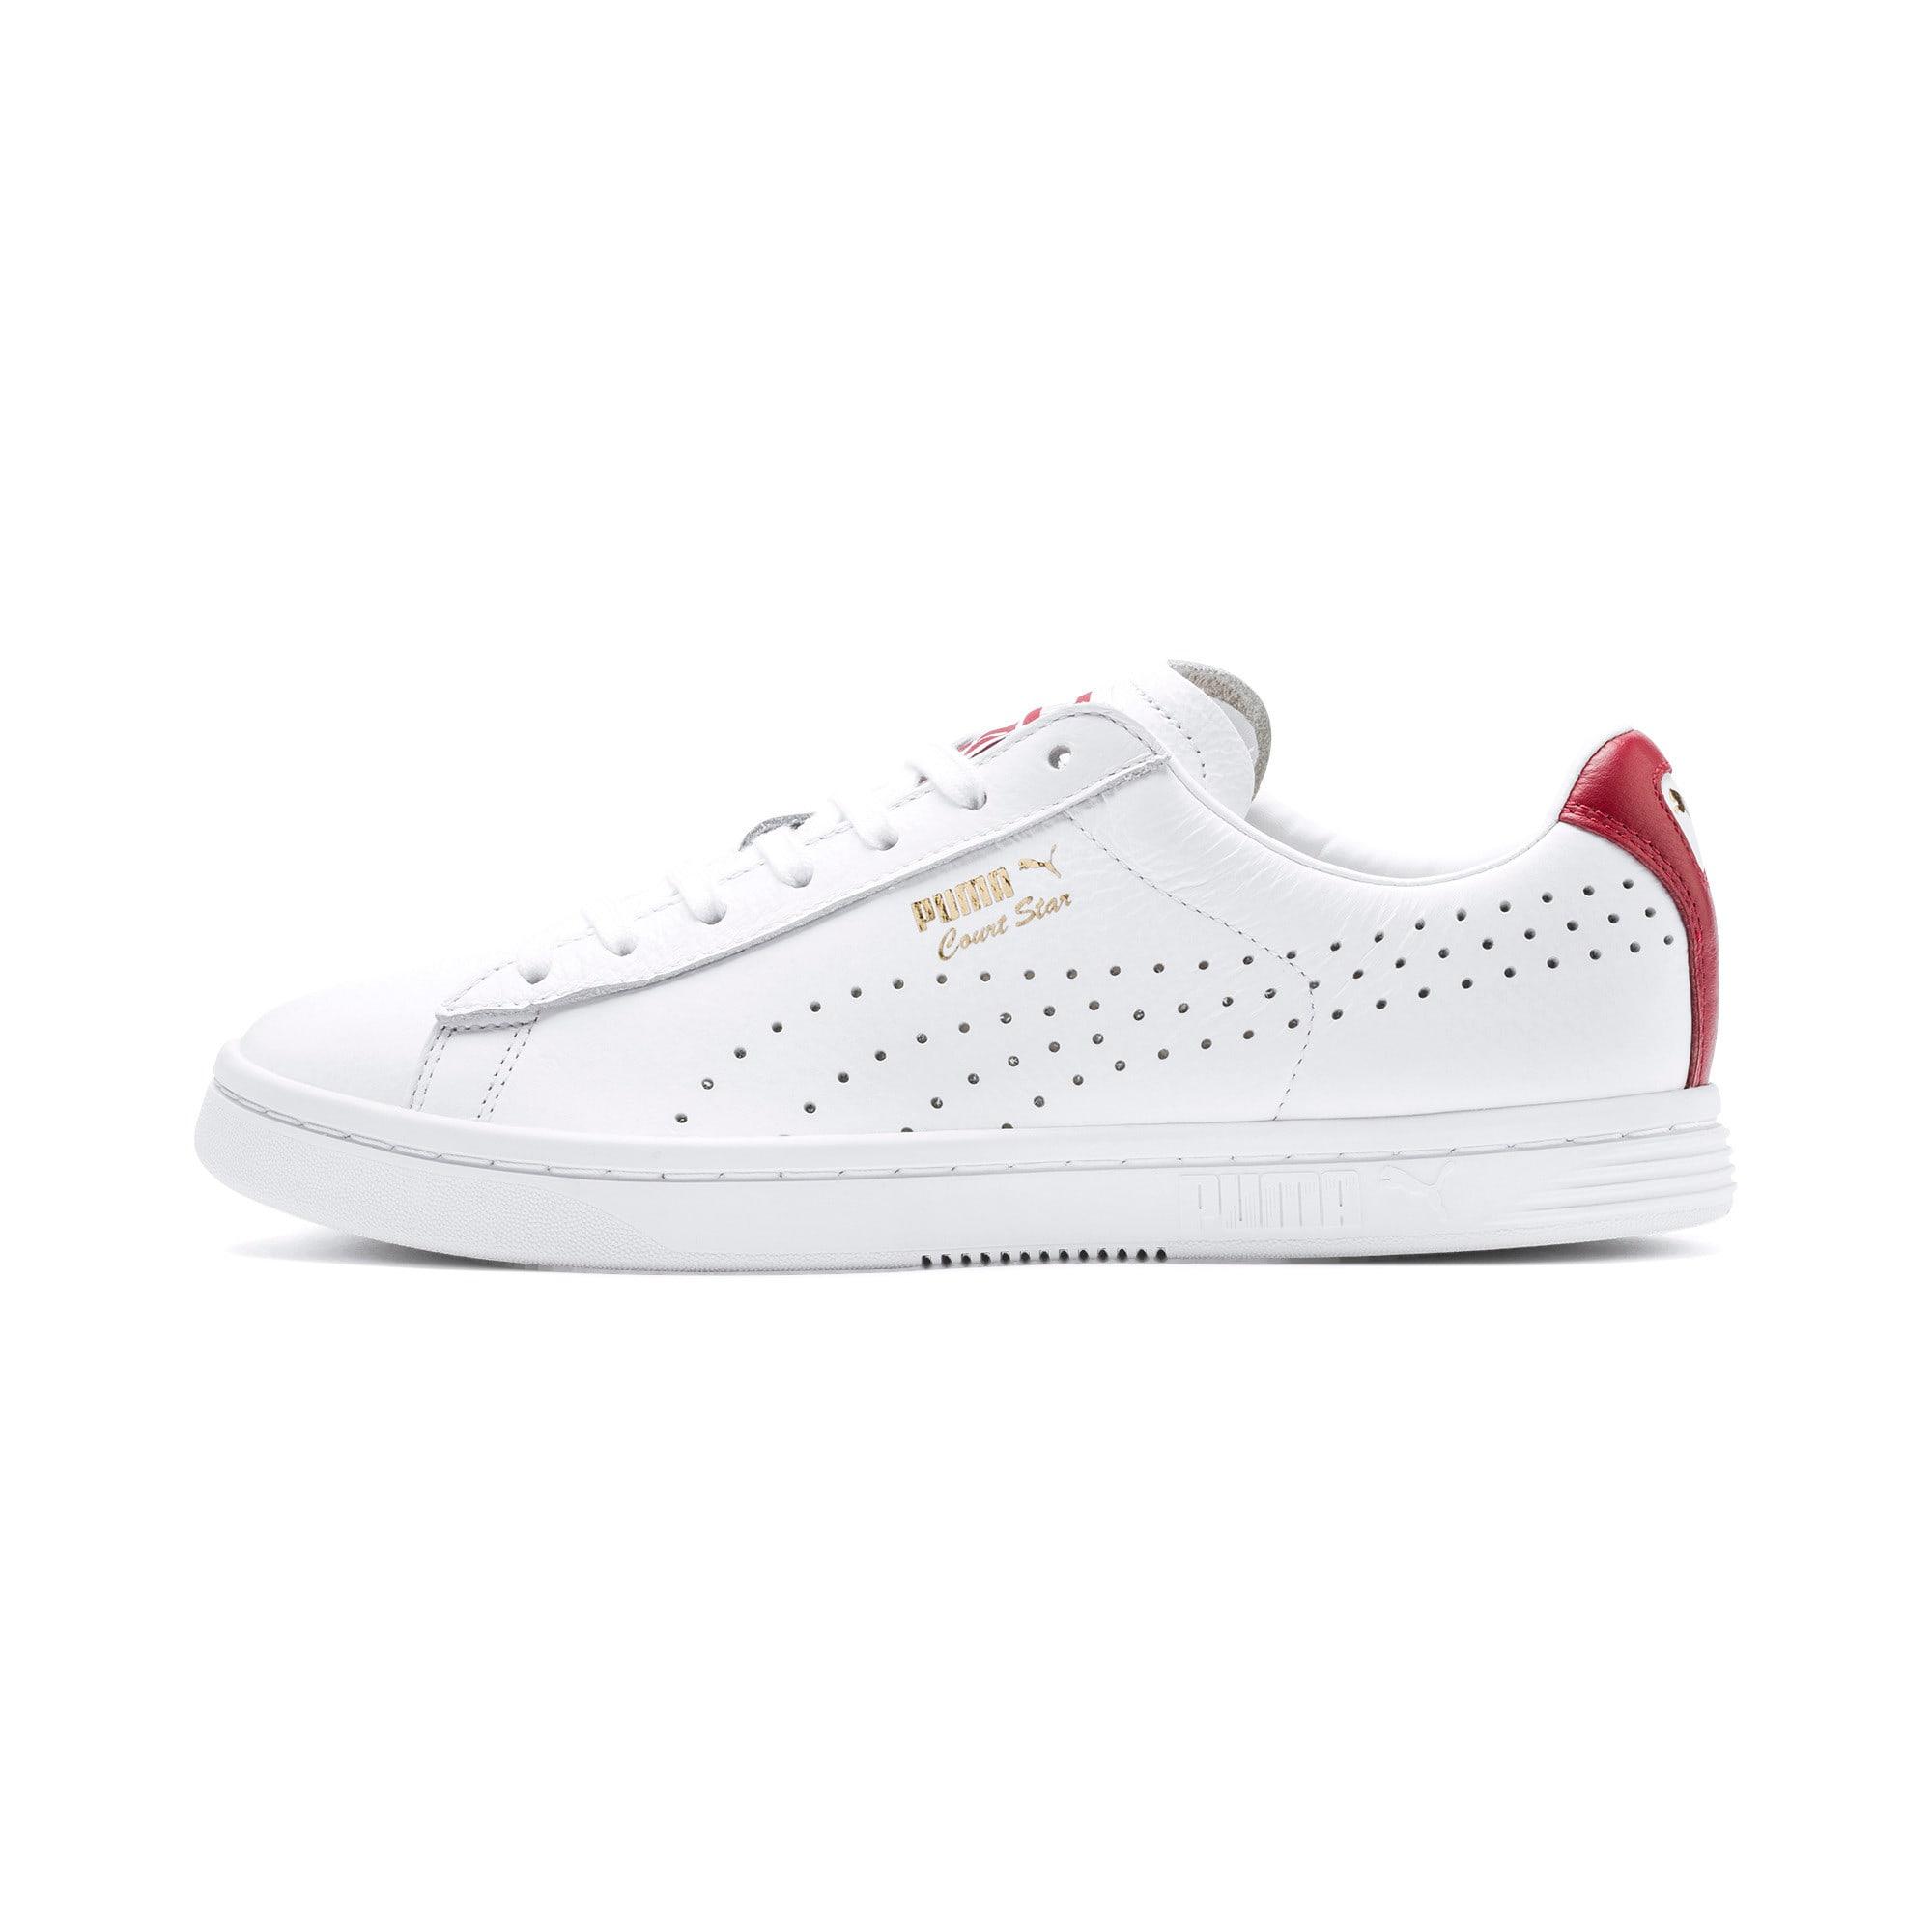 Thumbnail 1 of Court Star Sneakers, Puma White-Rhubarb, medium